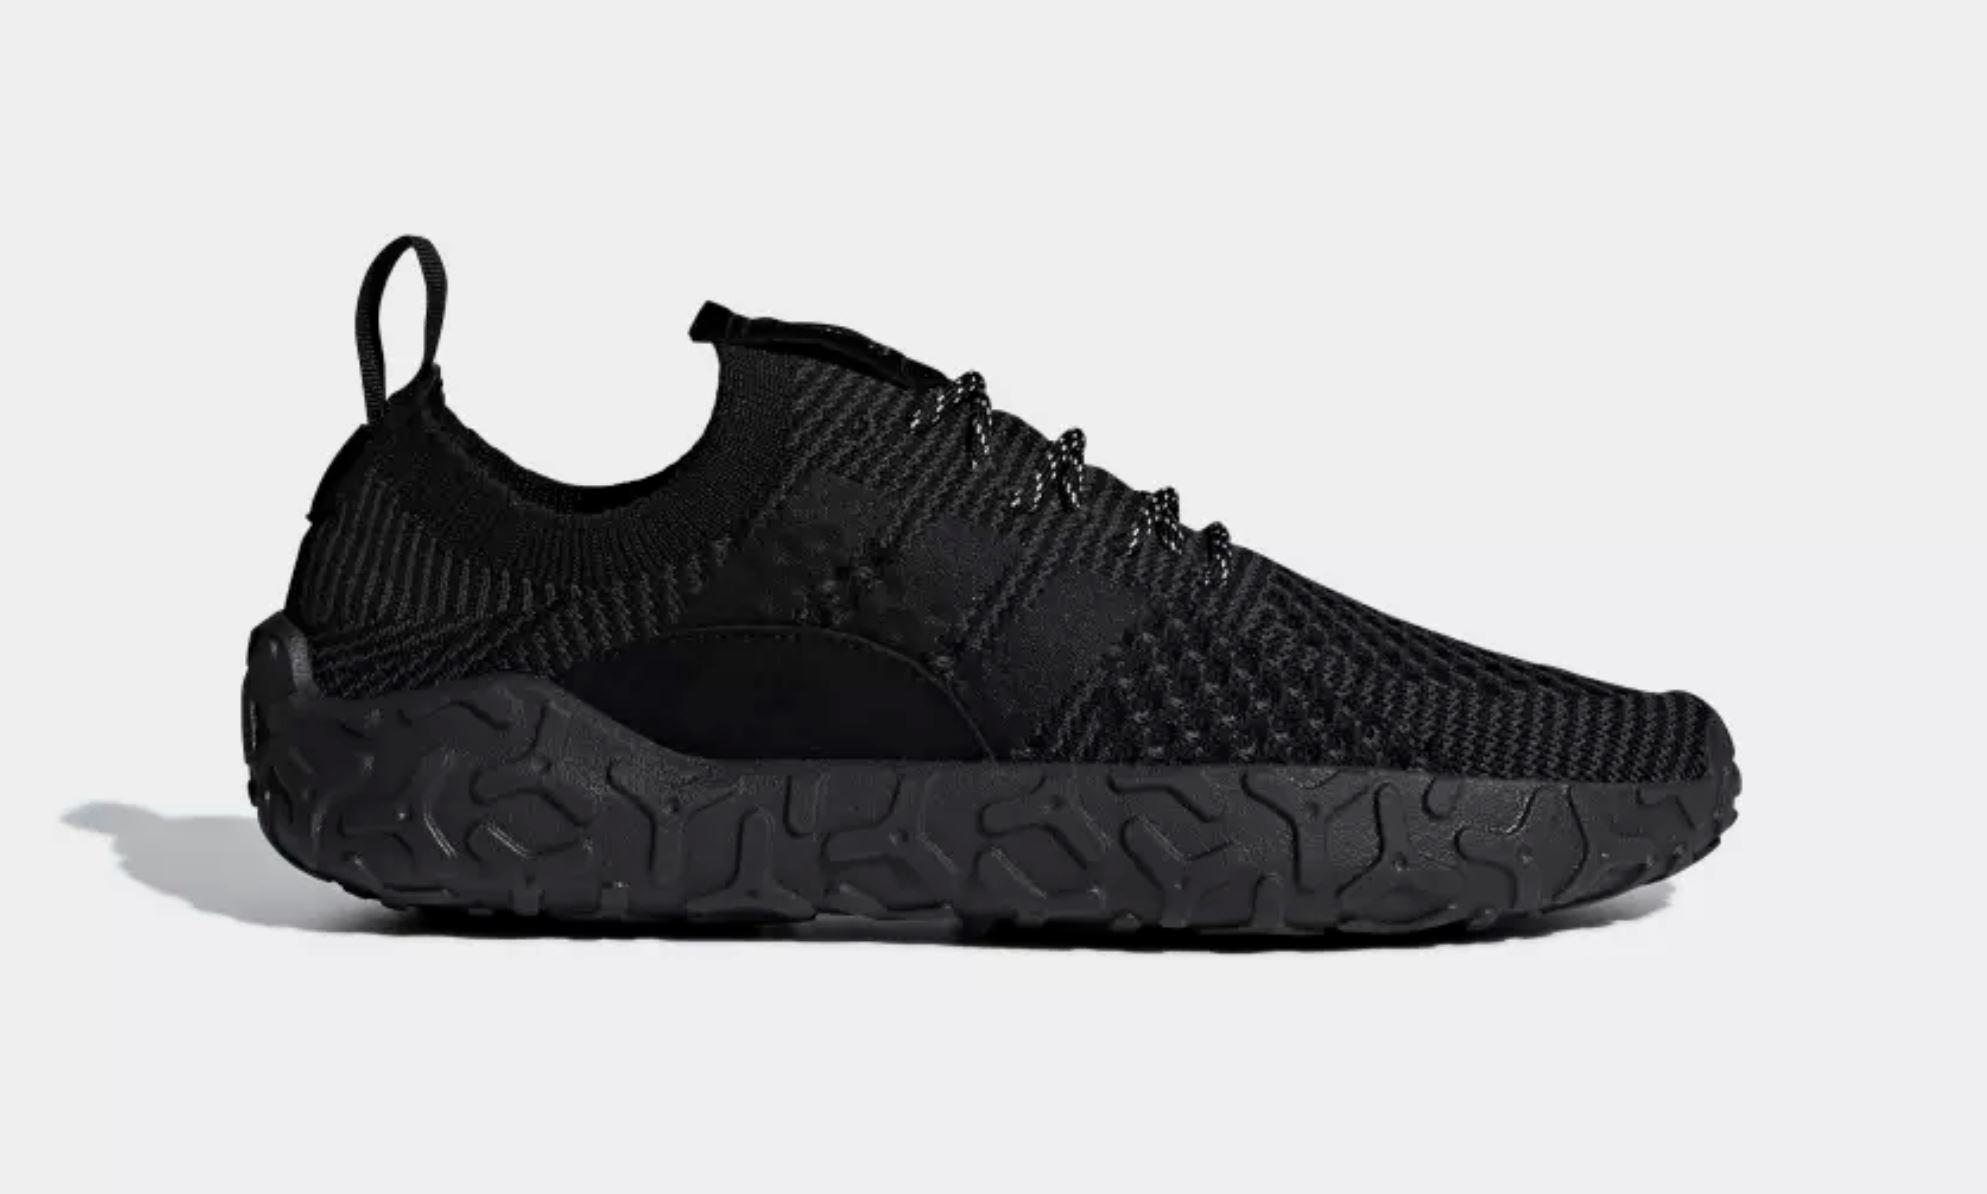 adidas F/22 Primeknit 'Triple Black